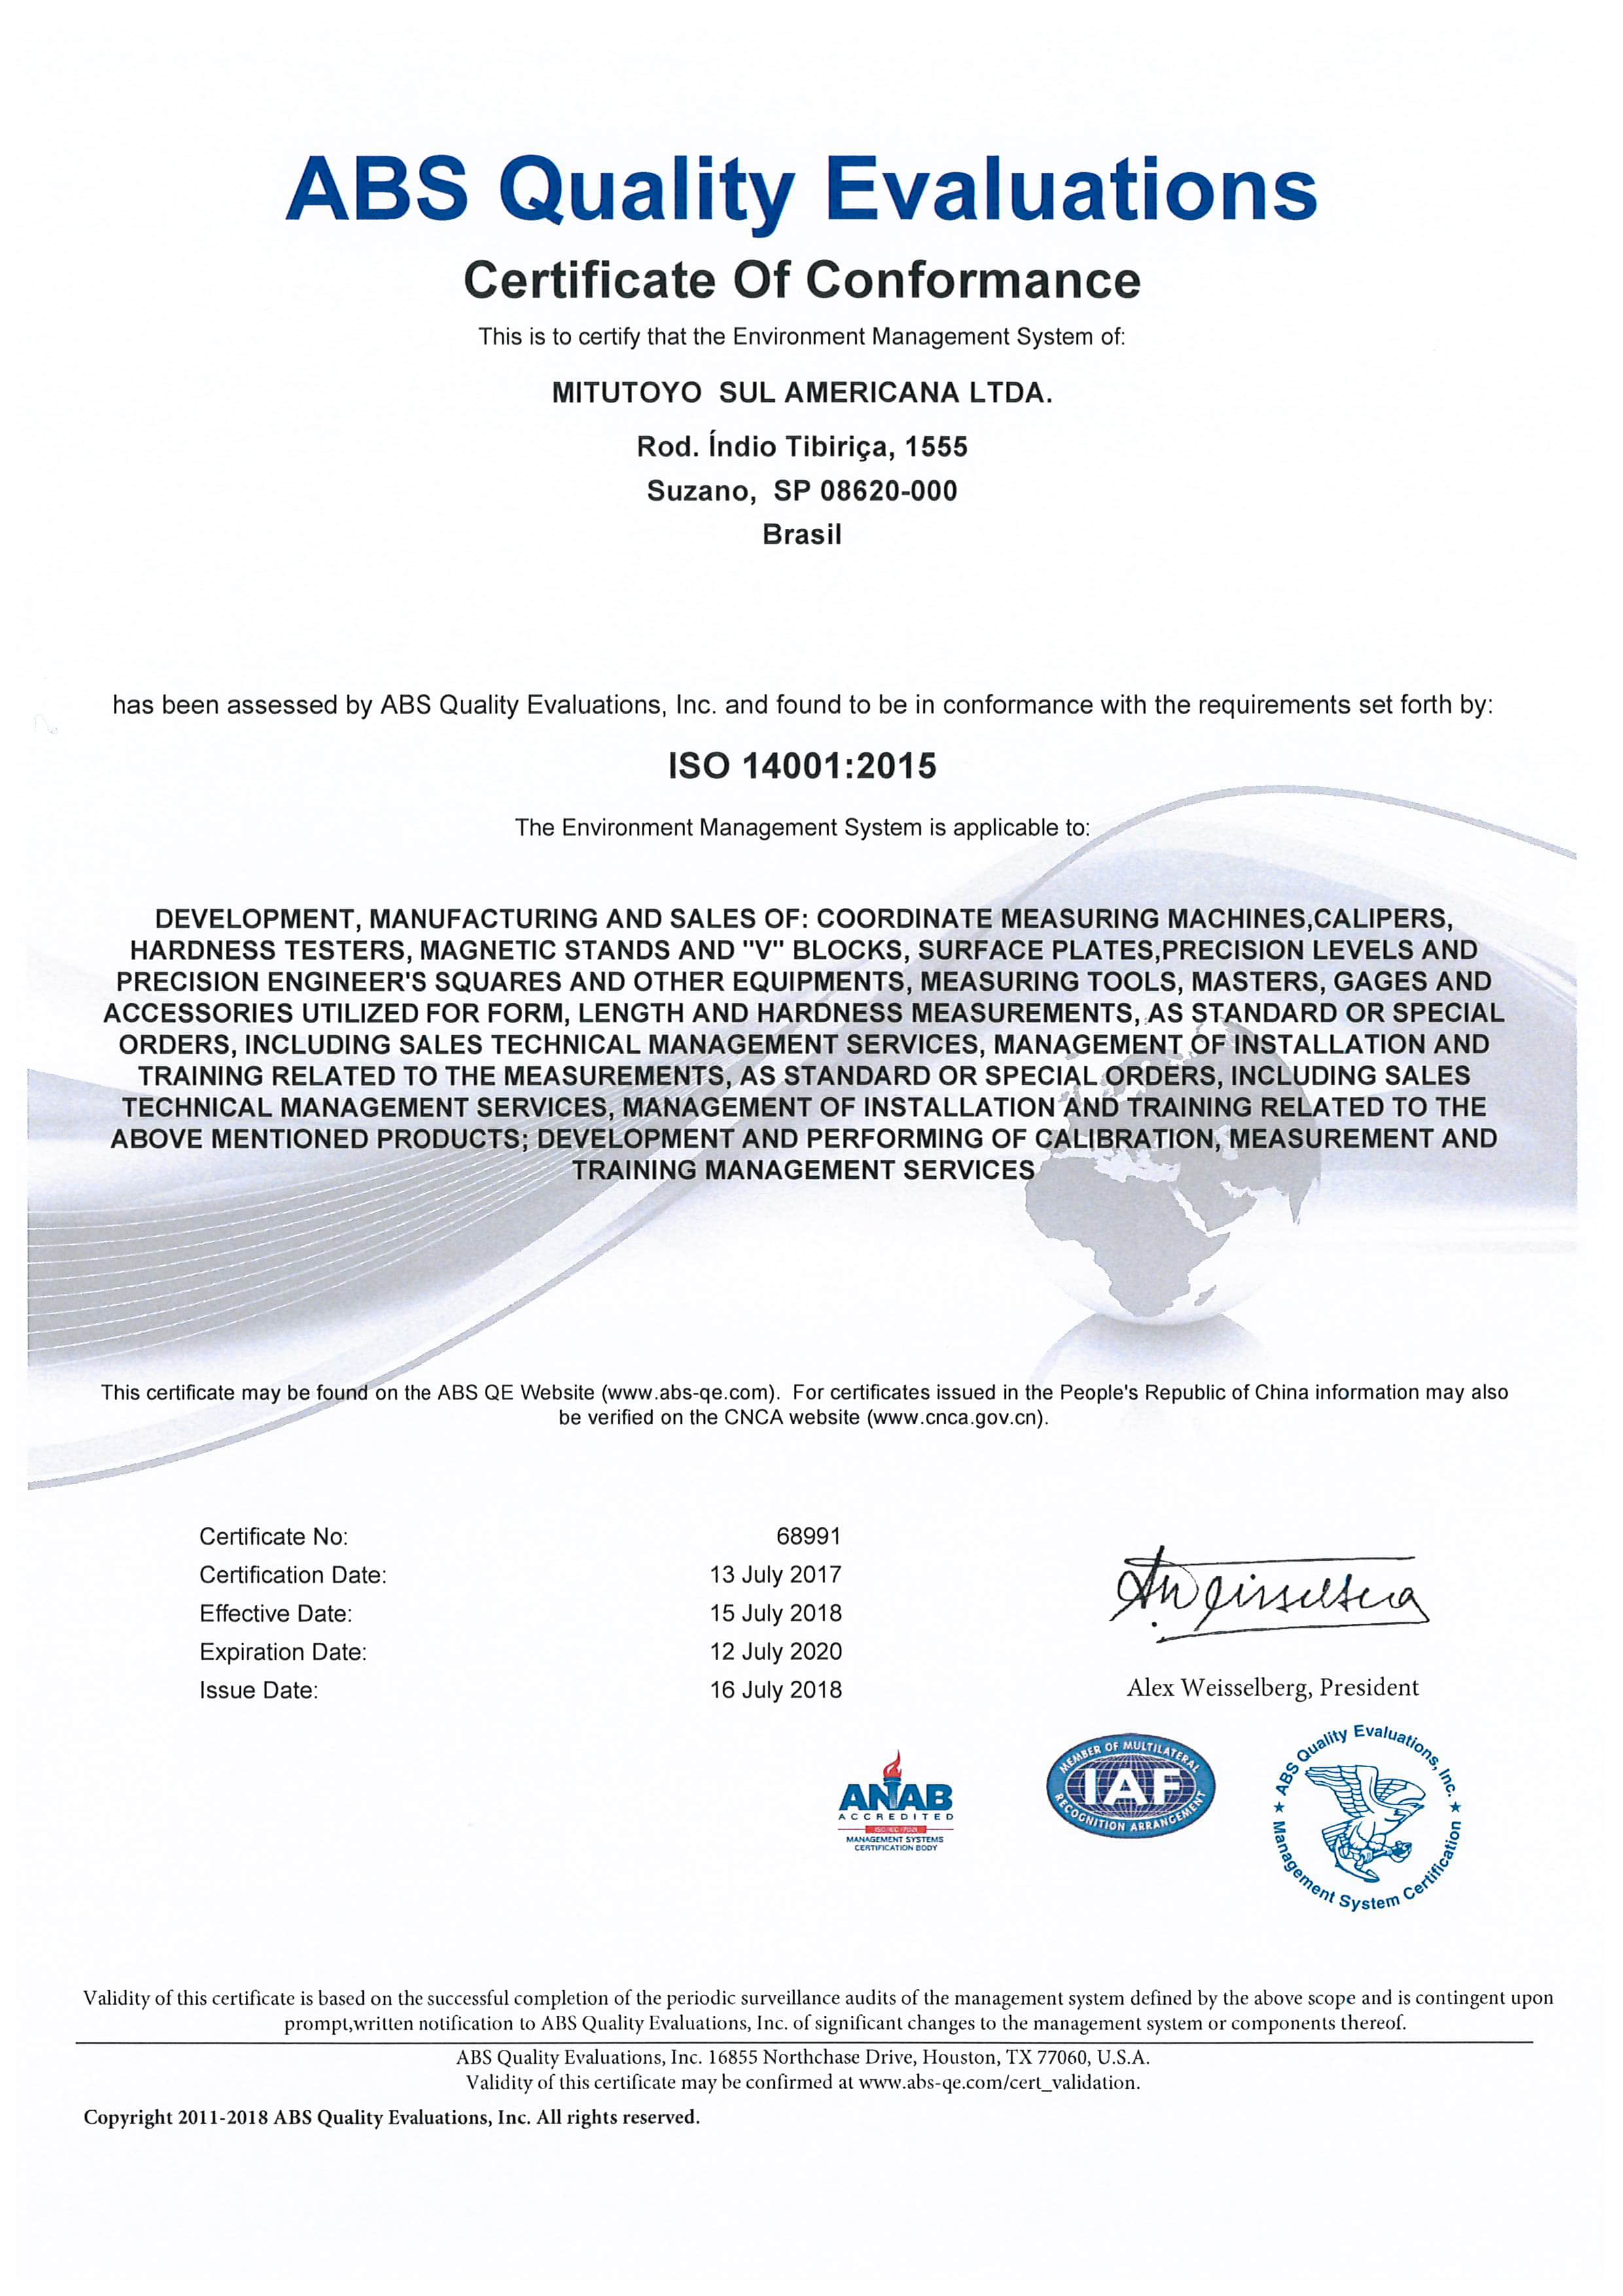 nbr iso 14001 pdf download